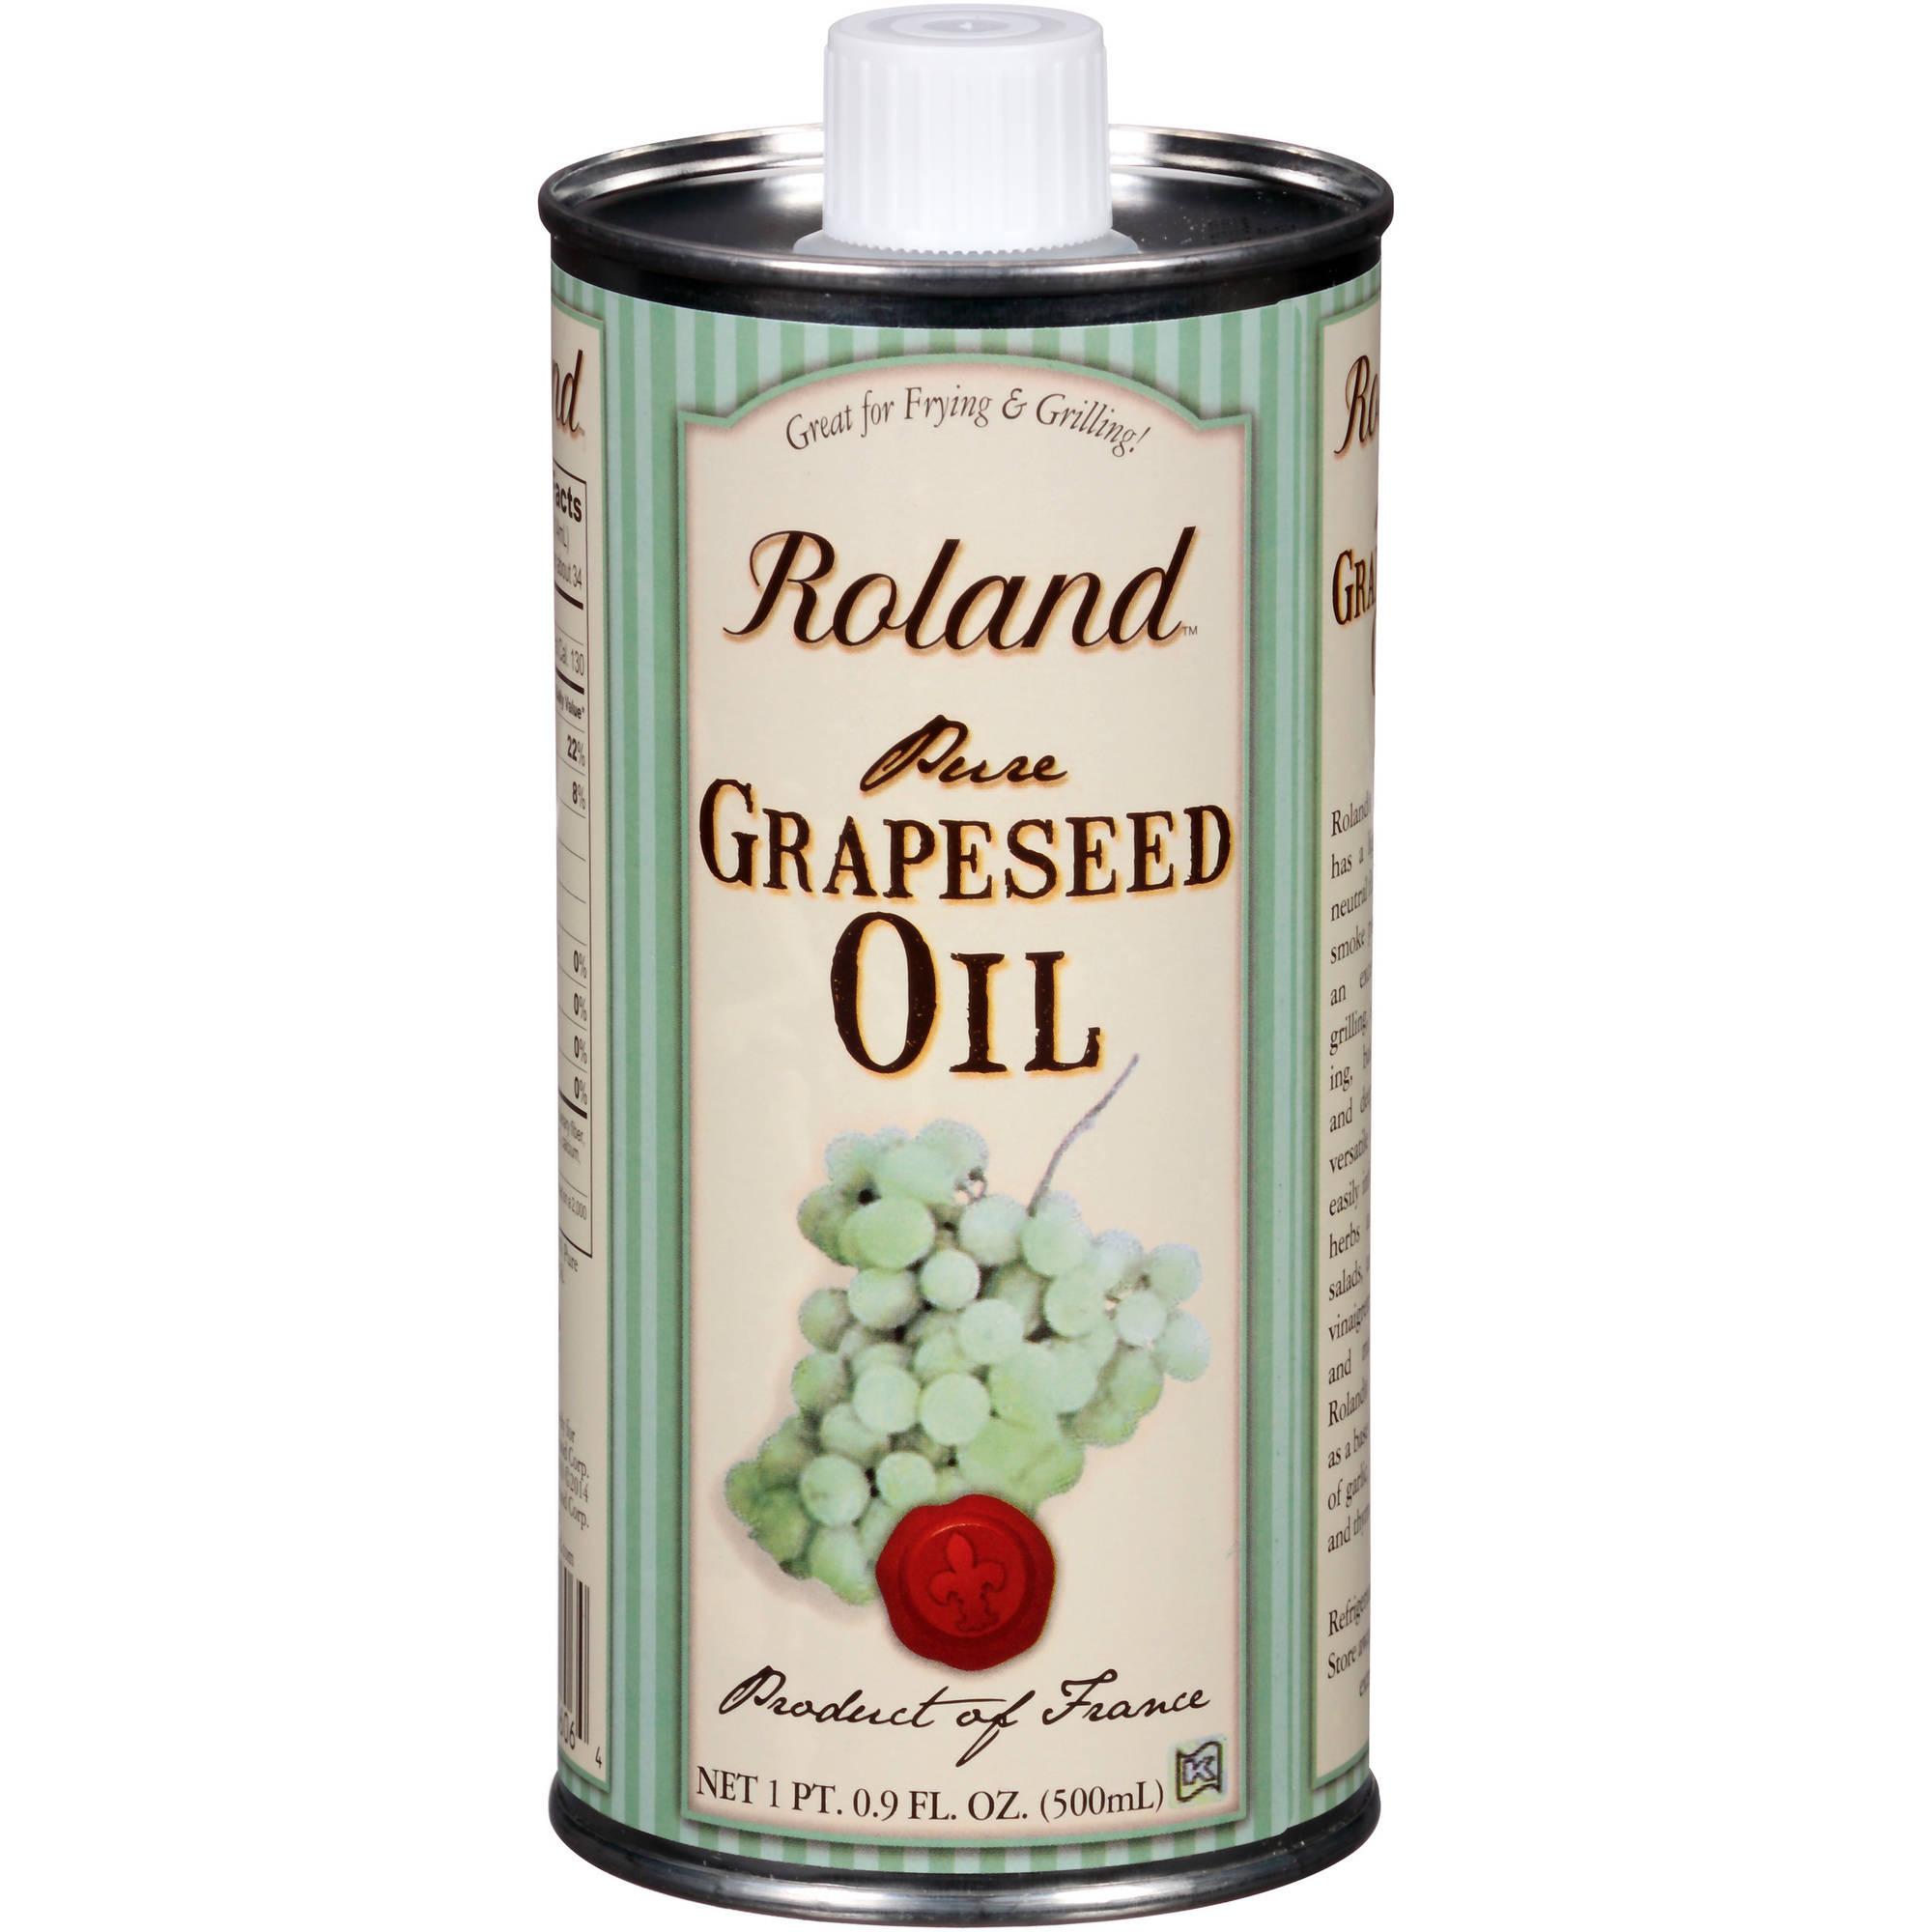 Roland Pure Grapeseed Oil, 16.9 fl oz